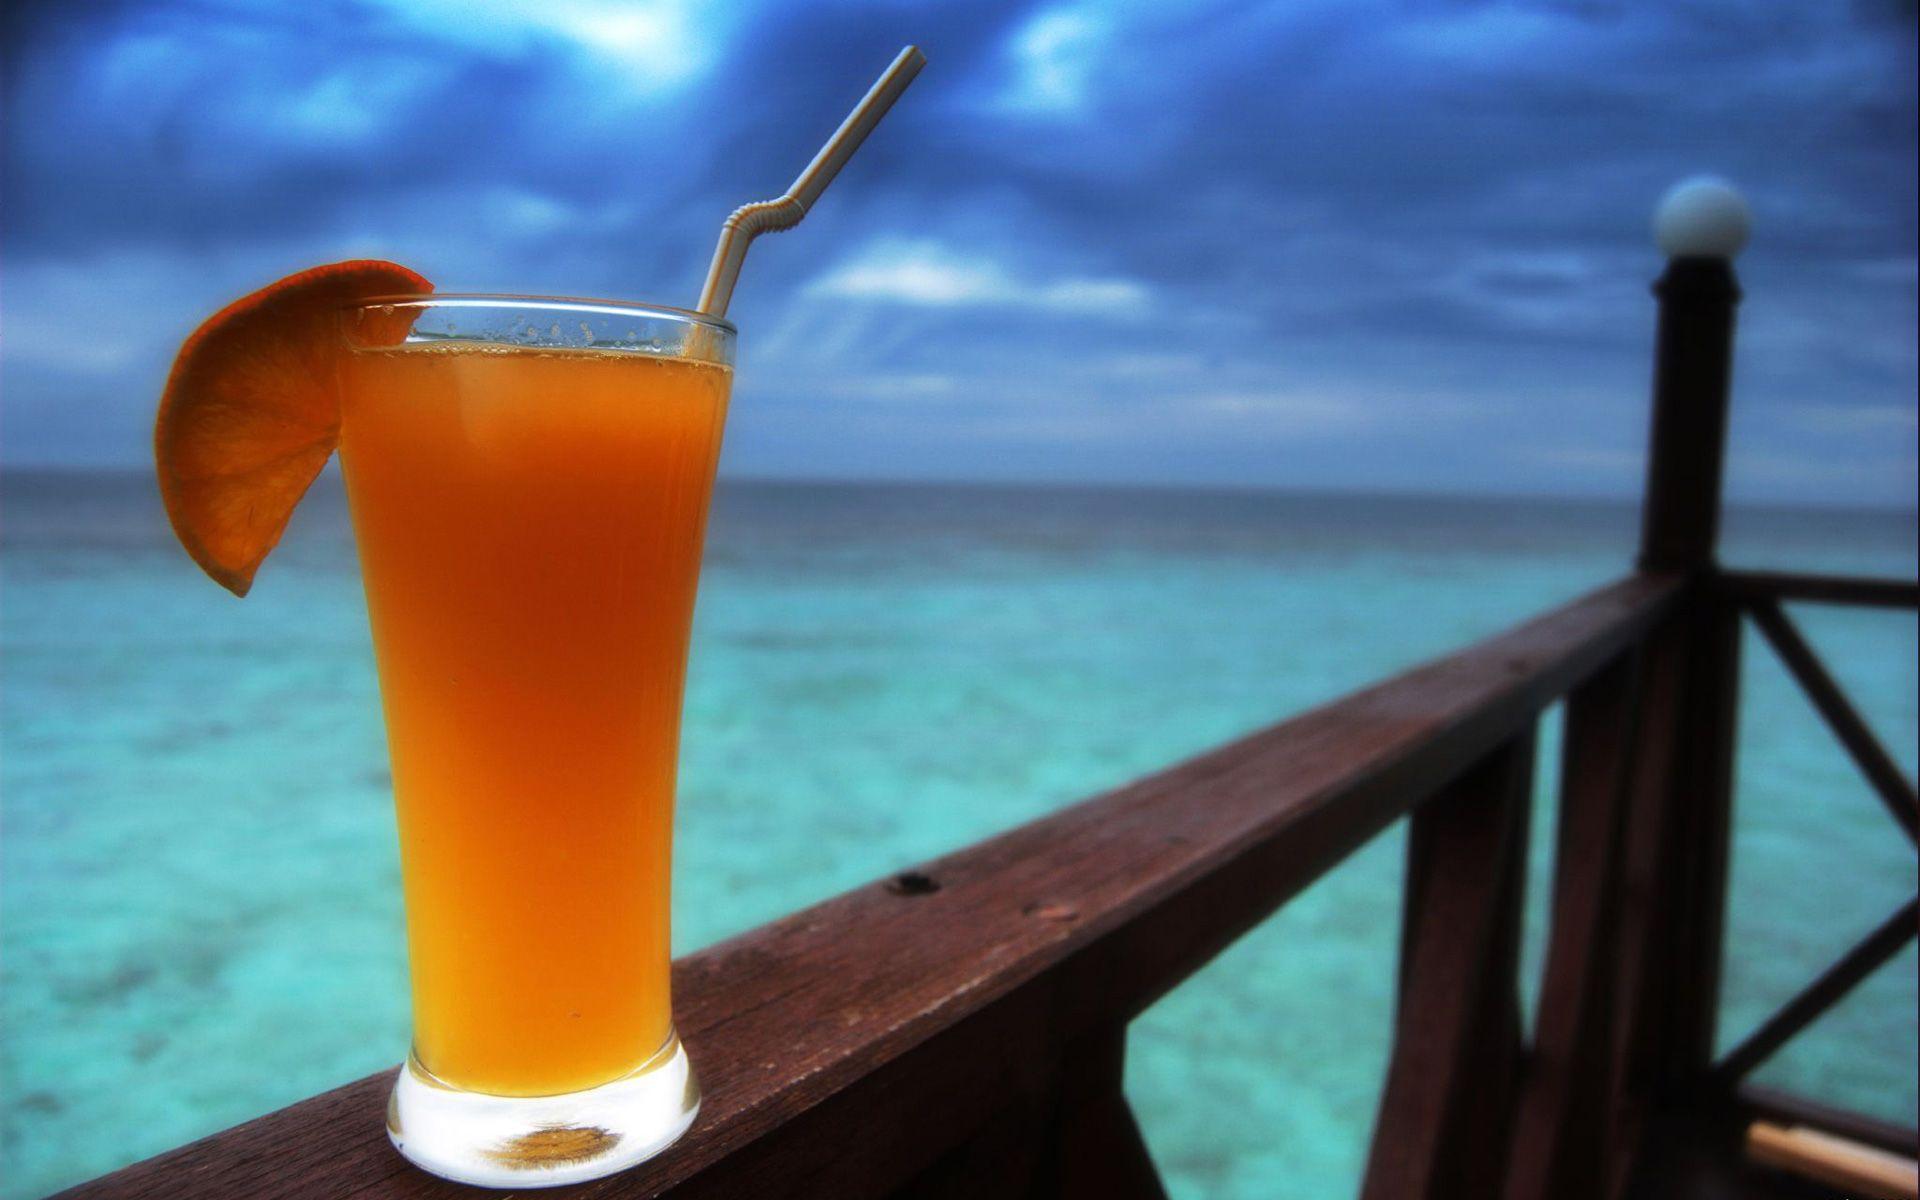 cocktail_tnomad9491_nc.jpg (1920×1200)